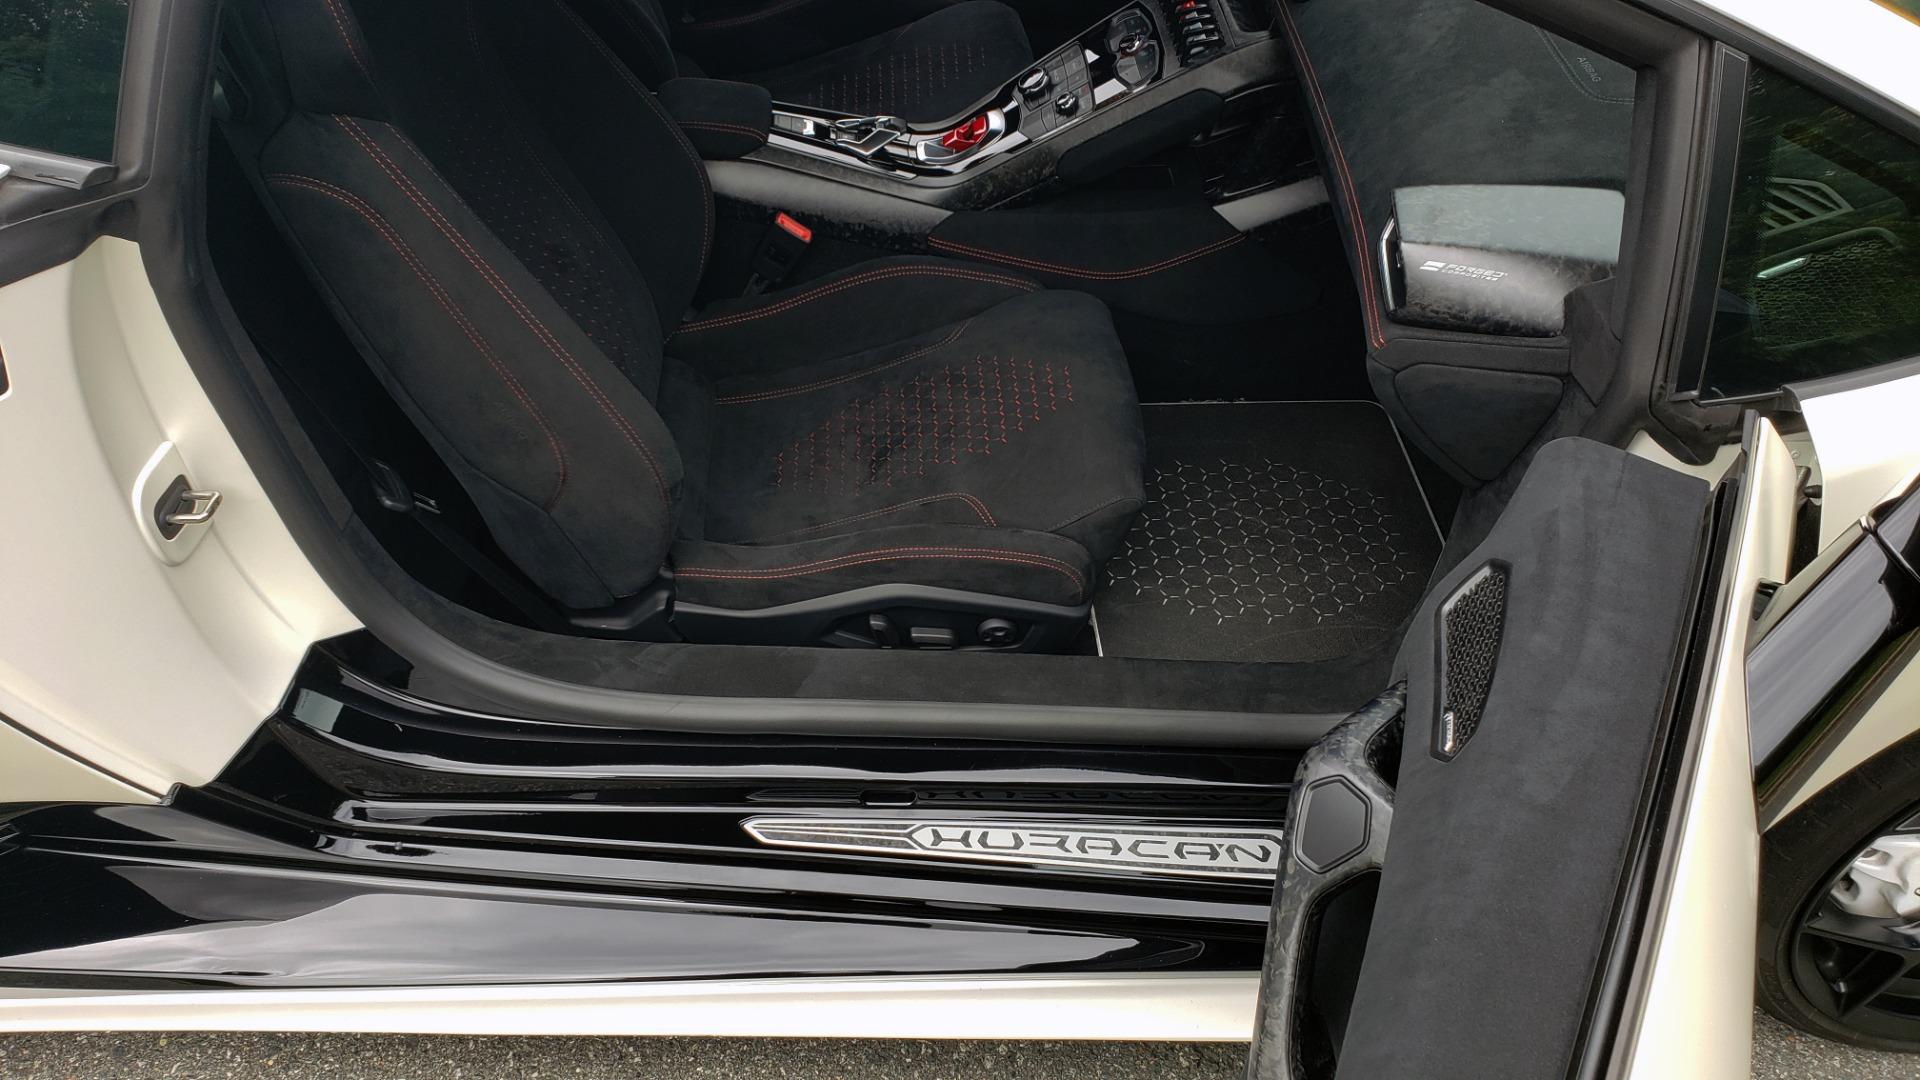 Used 2018 Lamborghini HURACAN PERFORMANTE 5.2L V10 / 630HP / 7-SPD AUTO / AWD / NAV / PREM SND for sale $269,995 at Formula Imports in Charlotte NC 28227 64